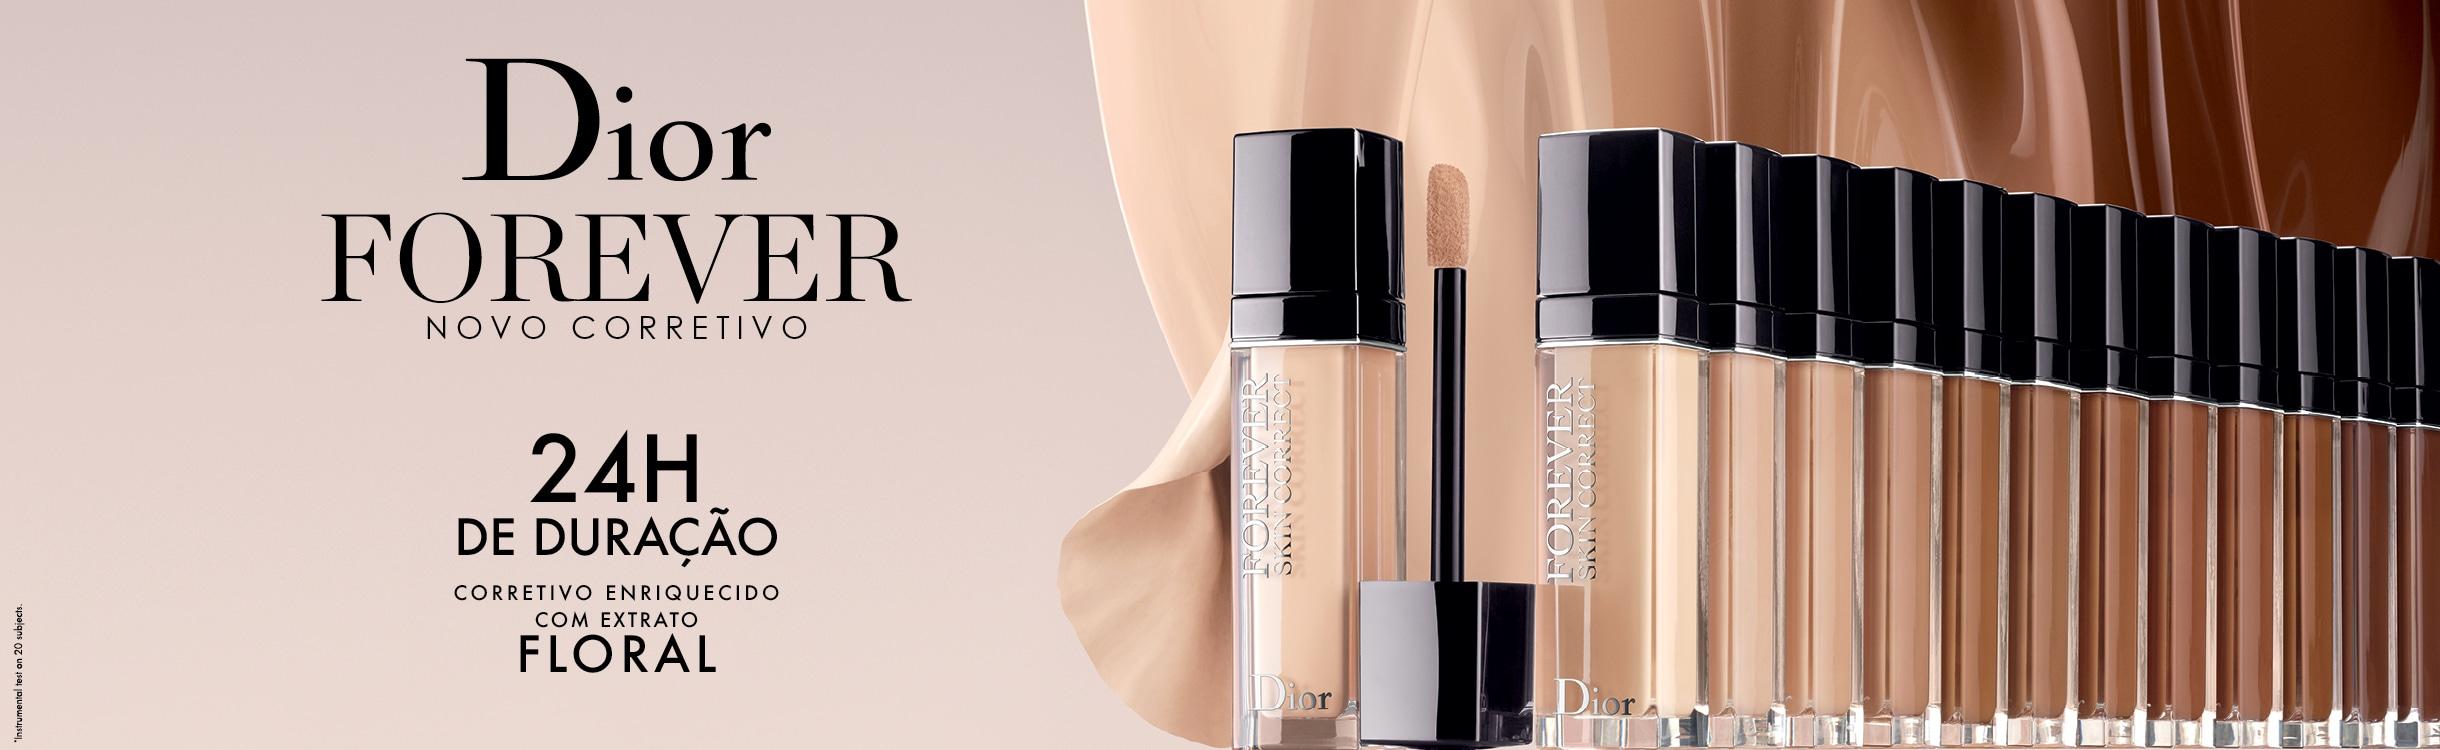 Dior/Forever